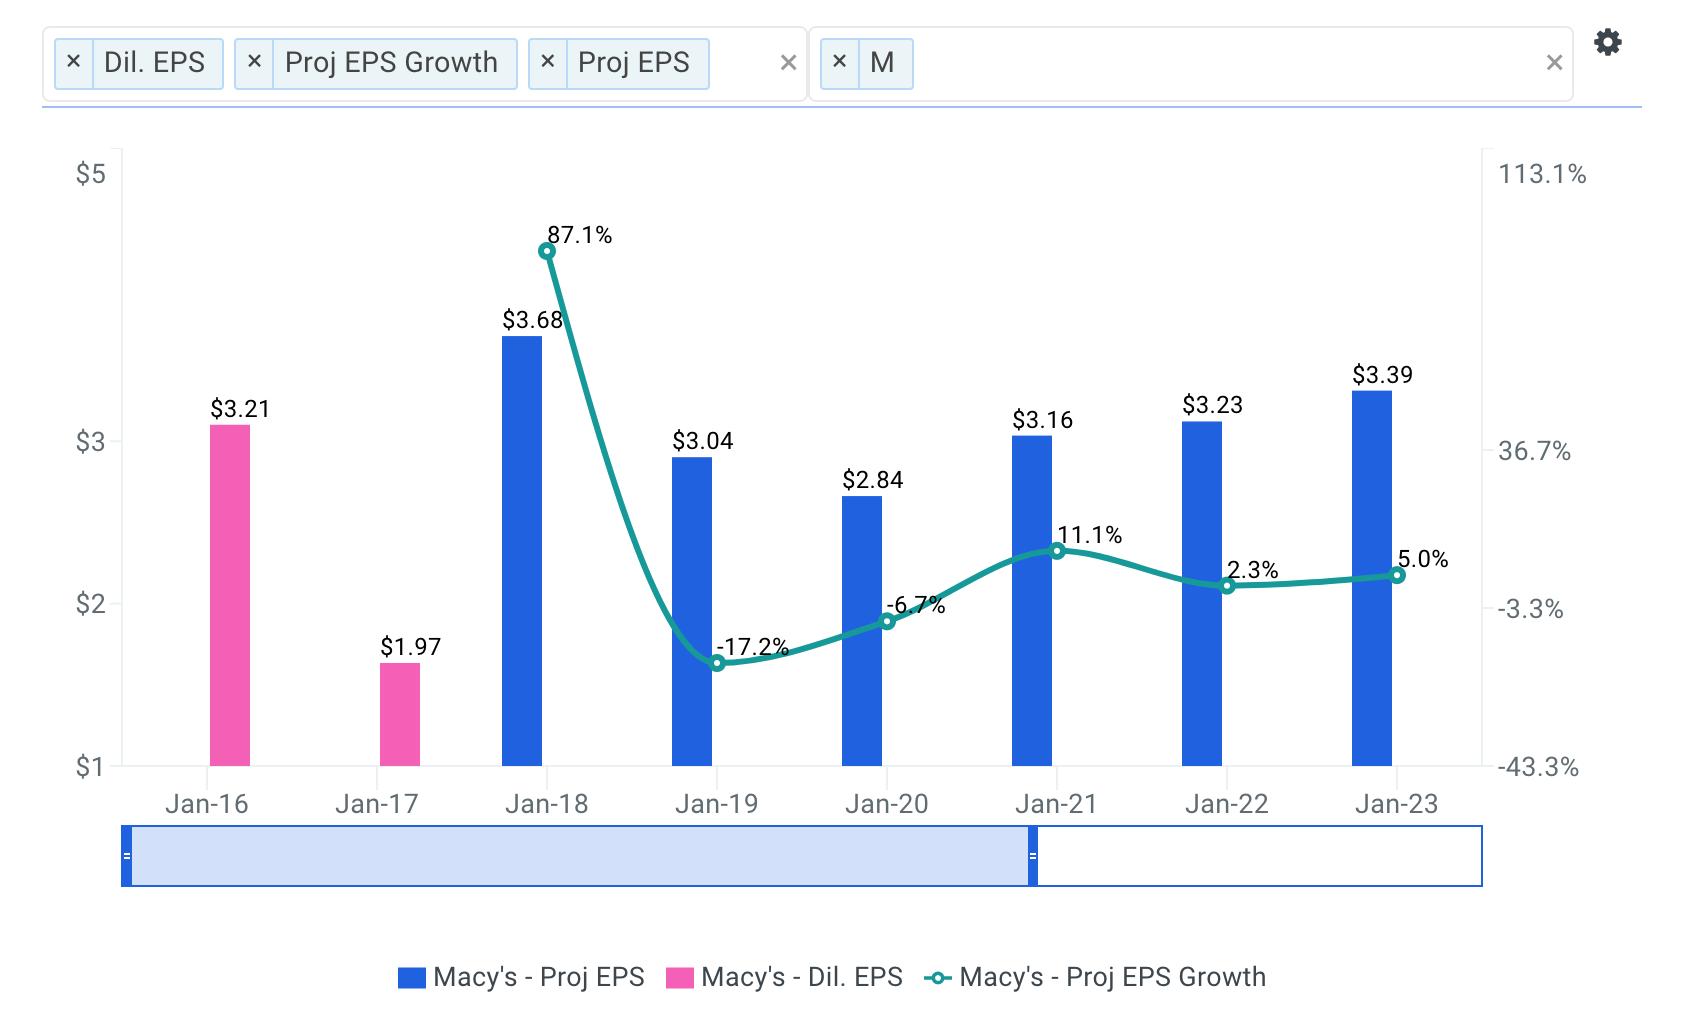 Macy's Earnings Forecast Chart